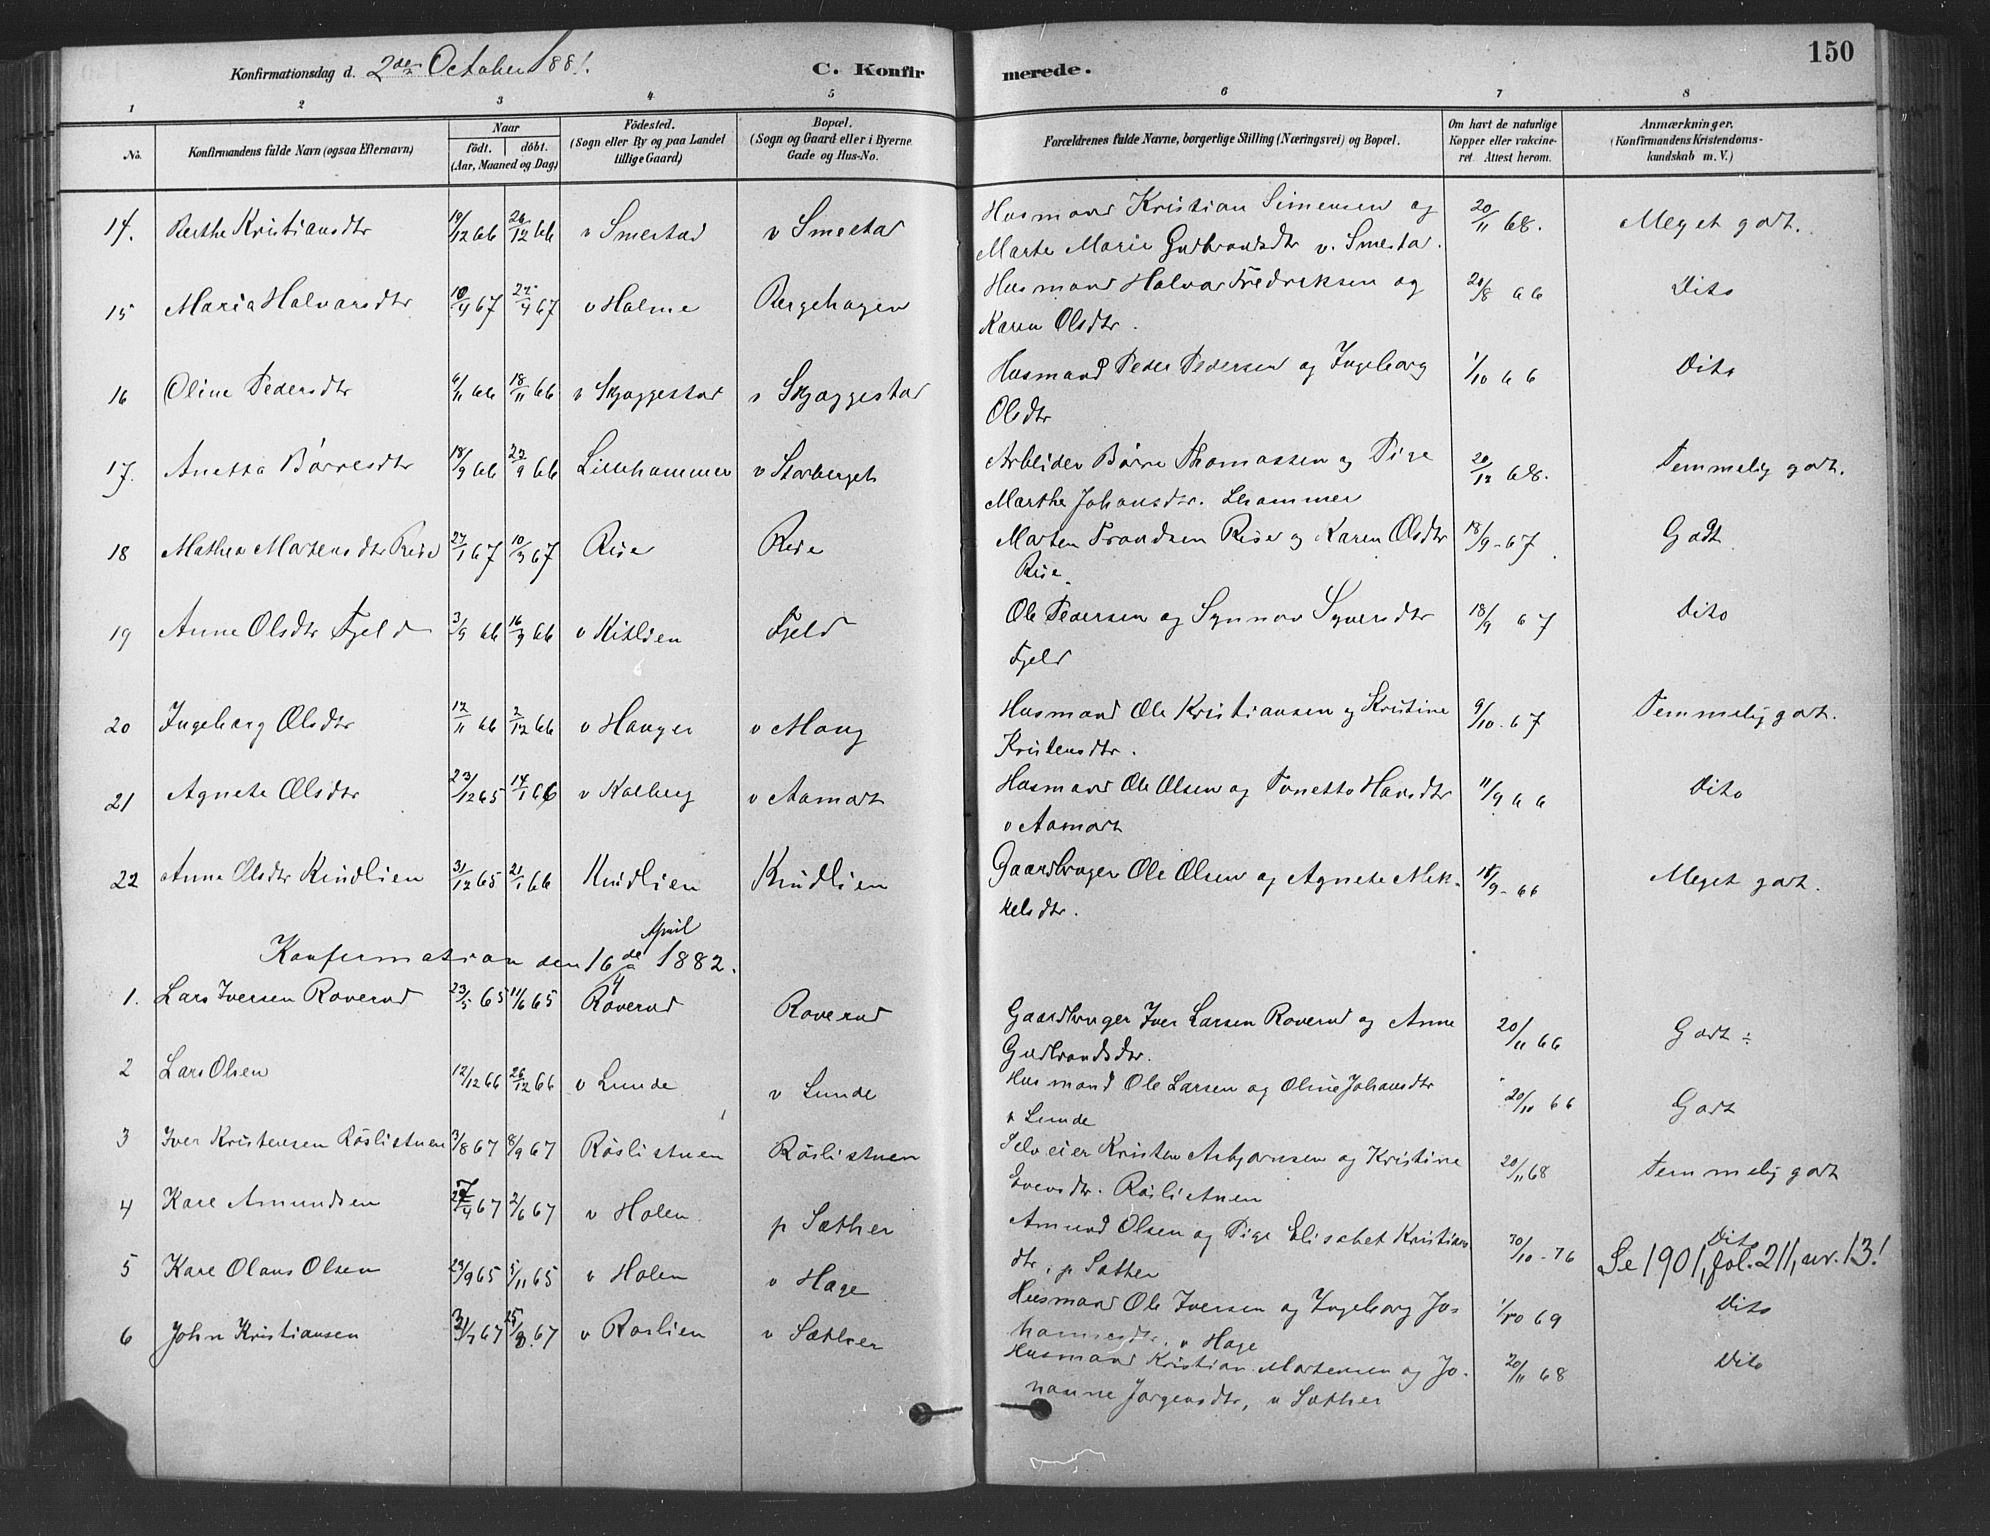 SAH, Fåberg prestekontor, Ministerialbok nr. 9, 1879-1898, s. 150